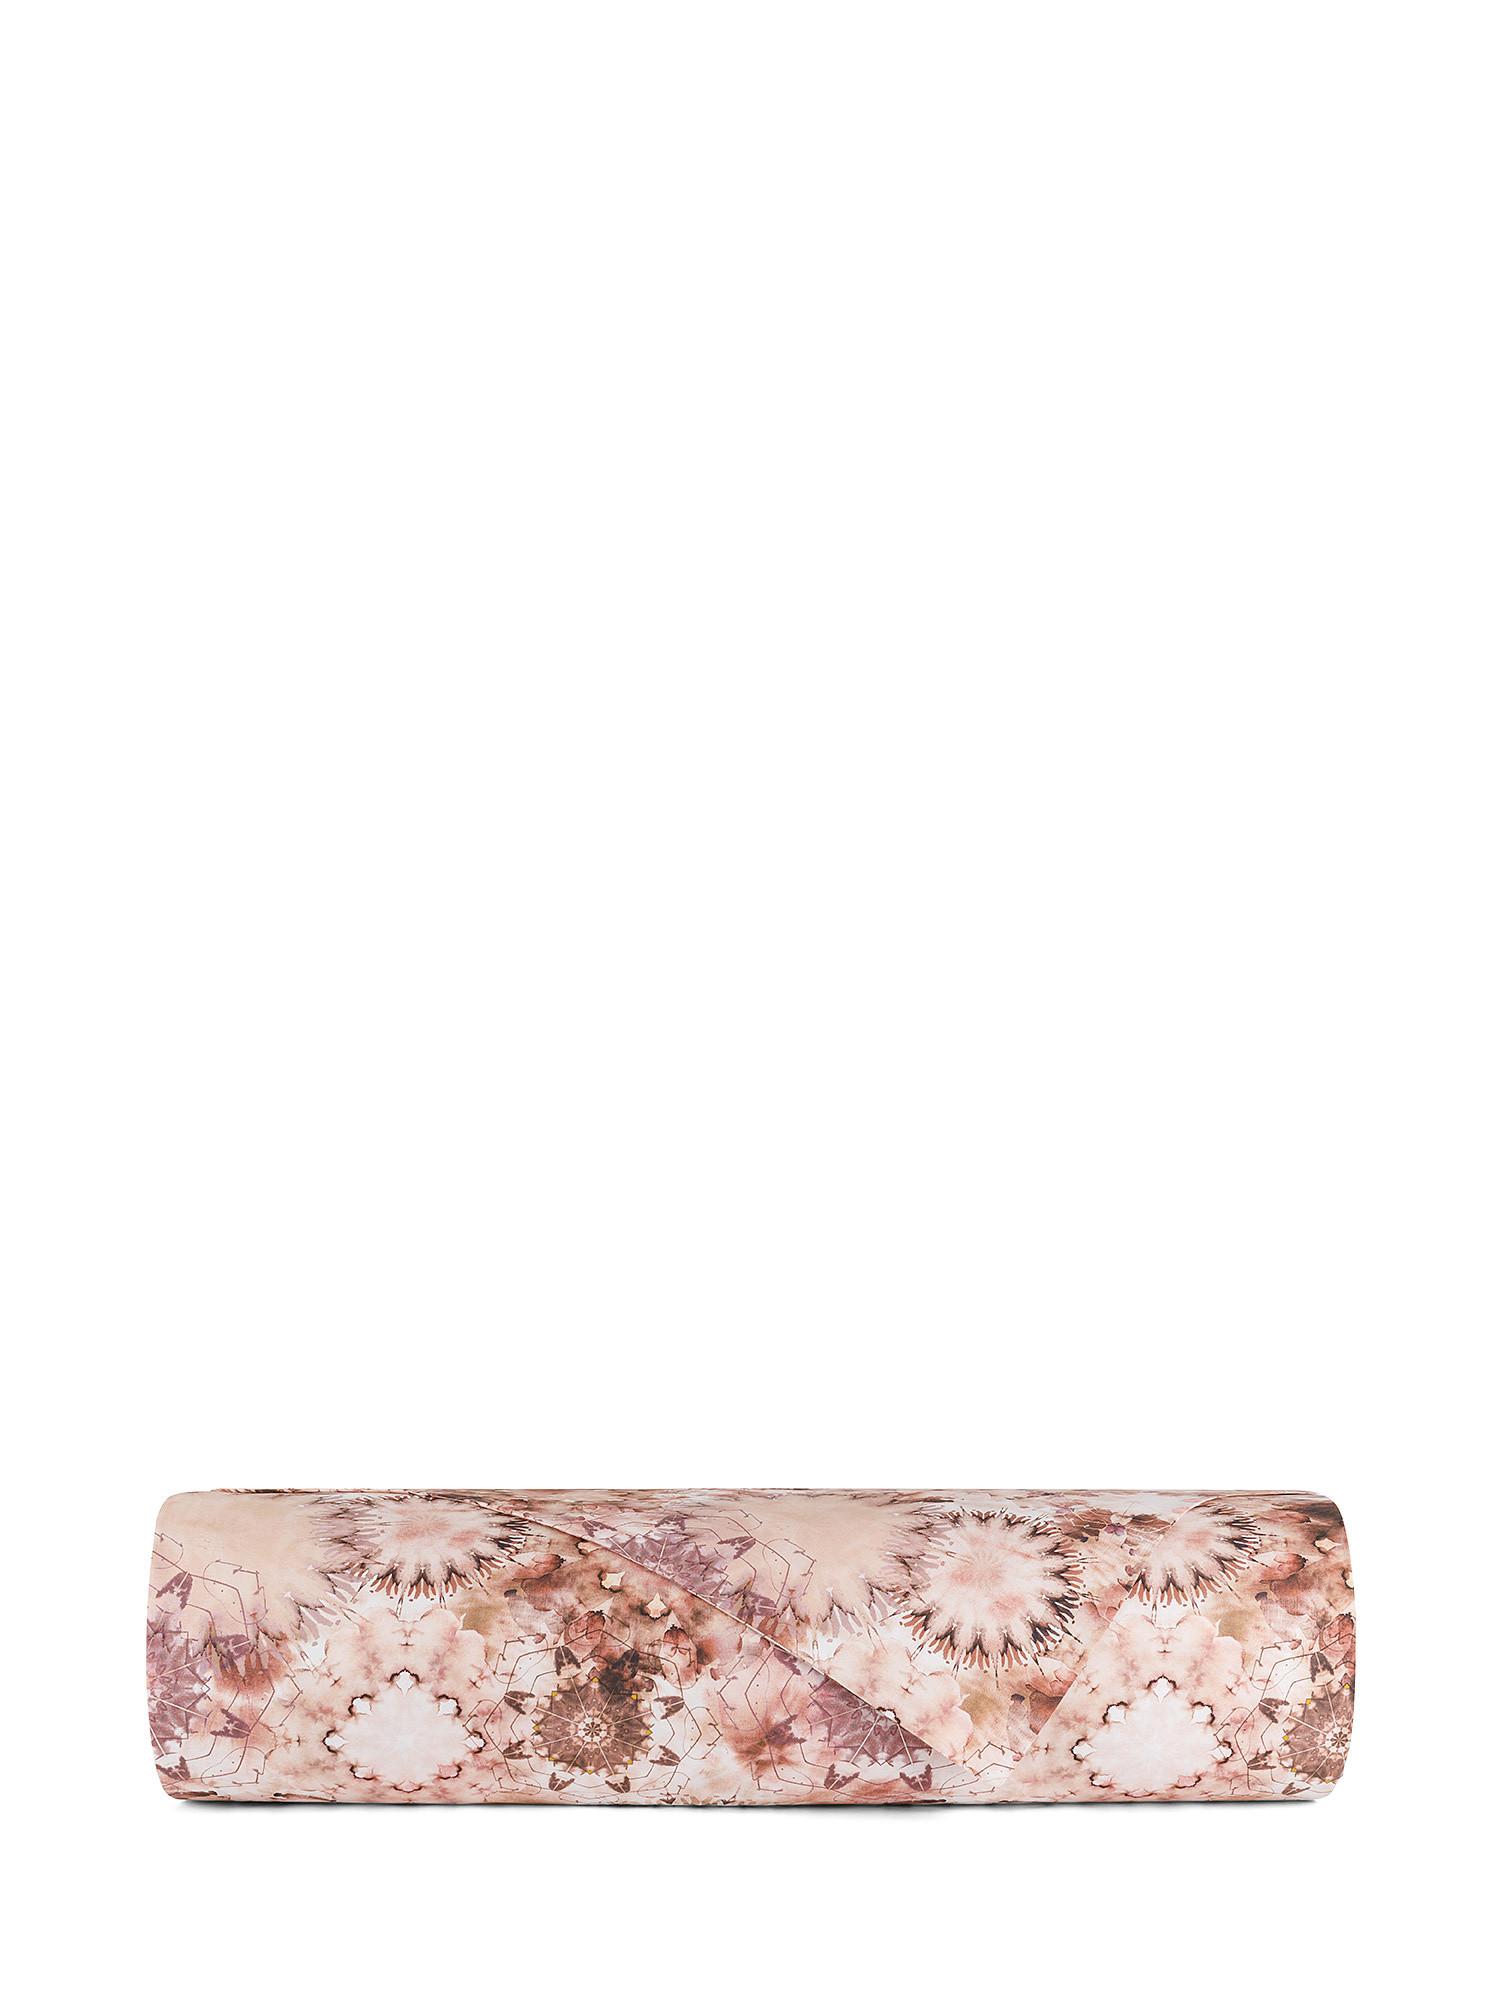 Copripiumino percalle di cotone fantasia floreale, Rosa, large image number 1